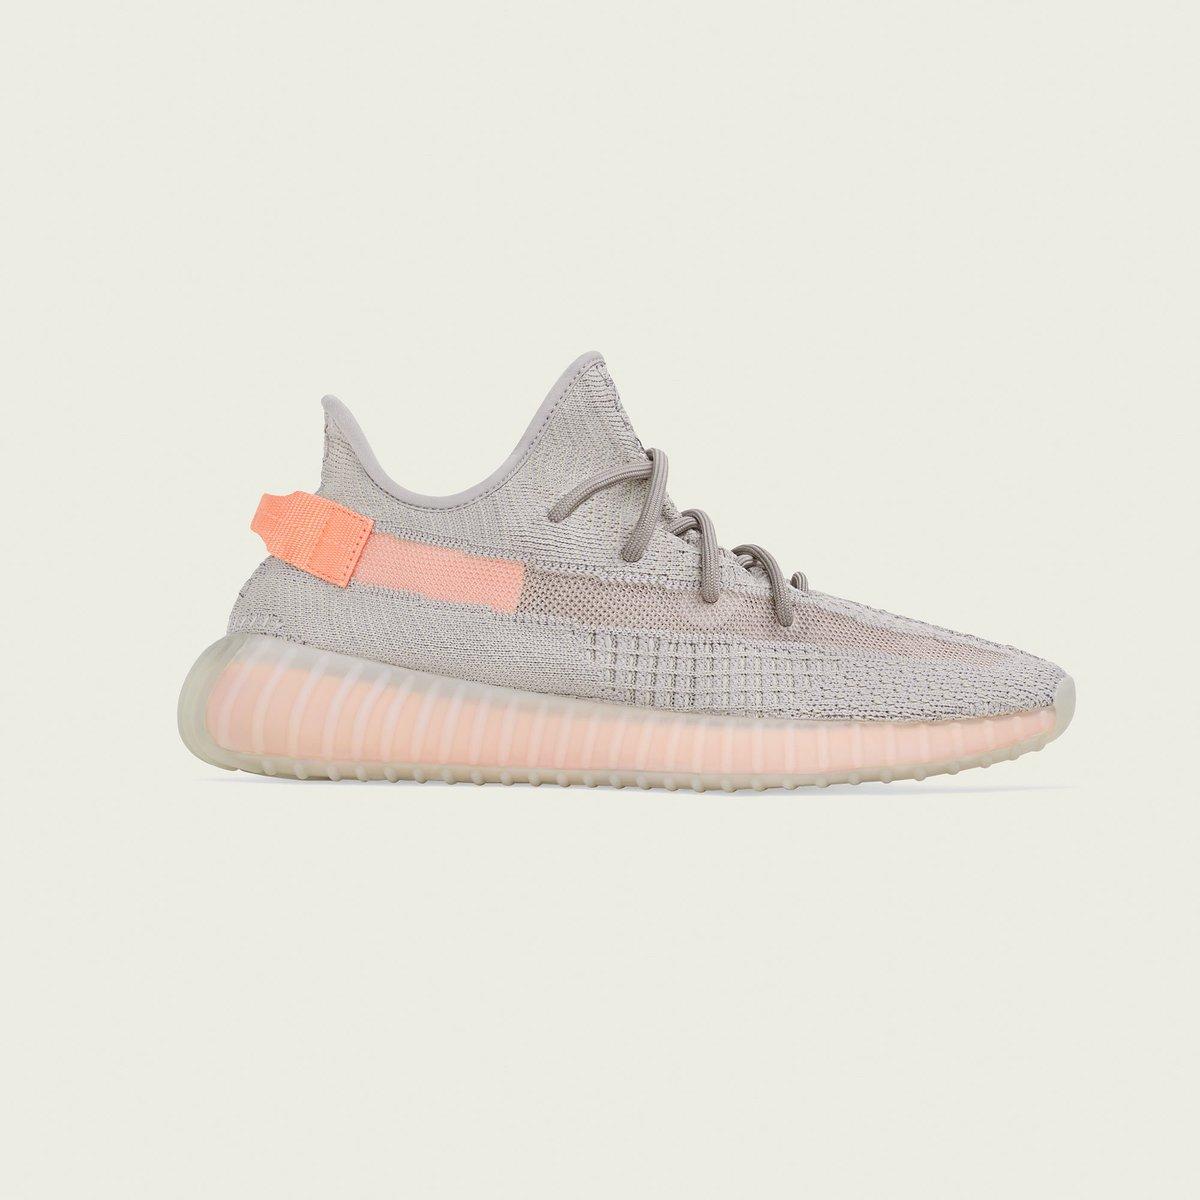 97e039be7e782 Regional exclusive Adidas Yeezy Boost 350 V2